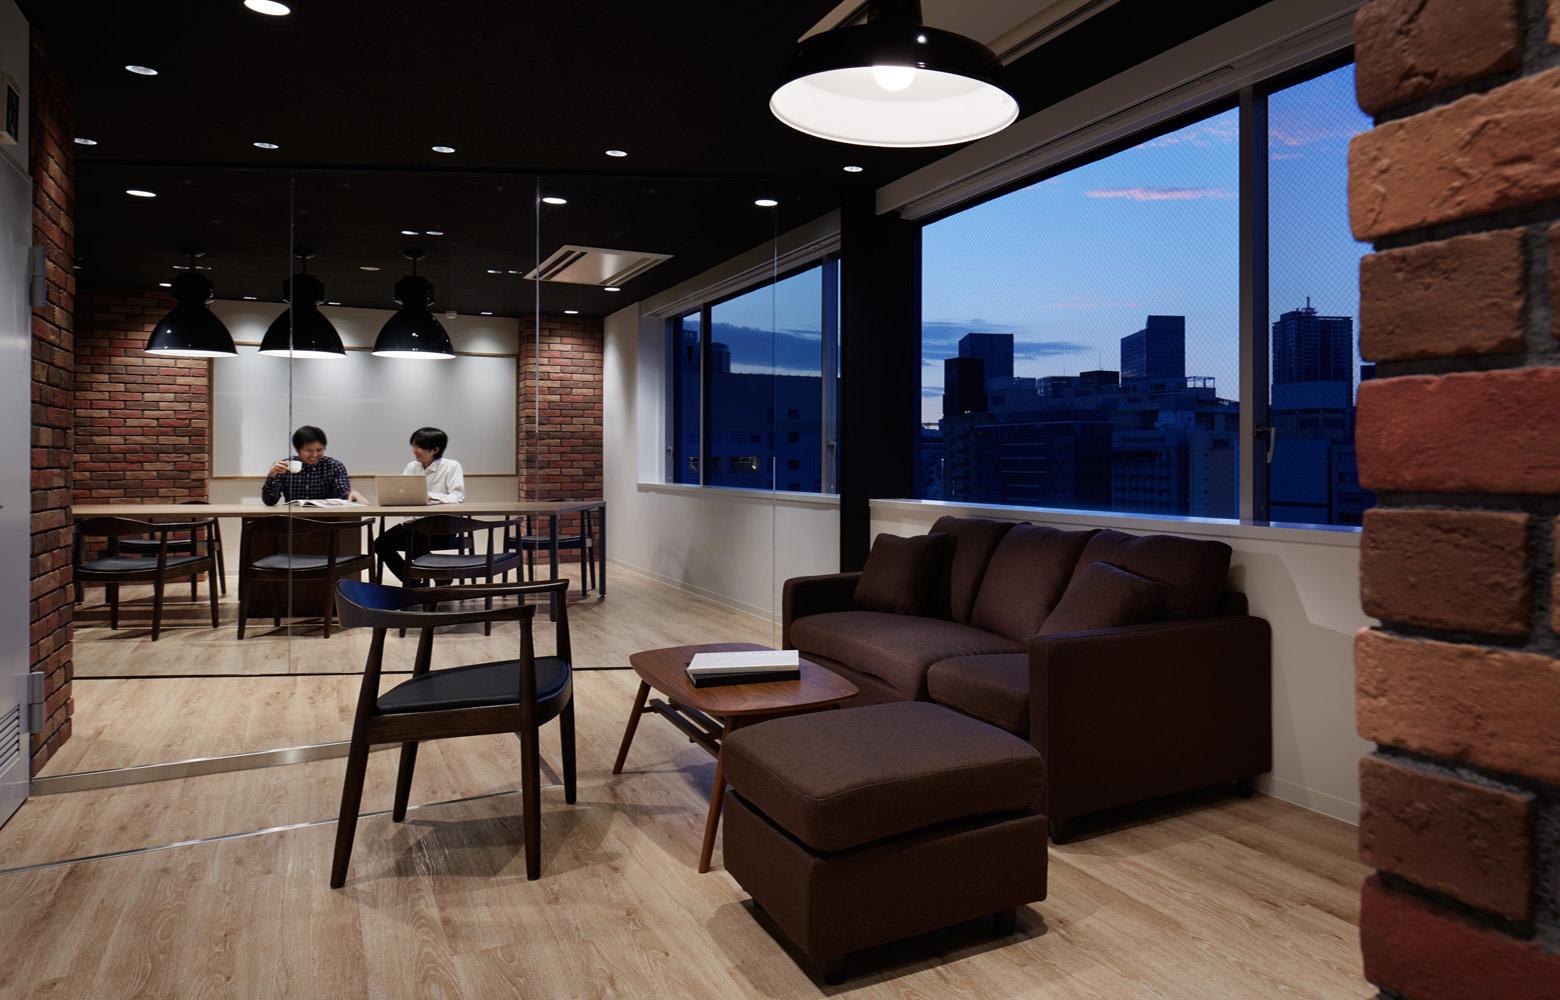 BEST株式会社 Refresh Space デザイン・レイアウト事例